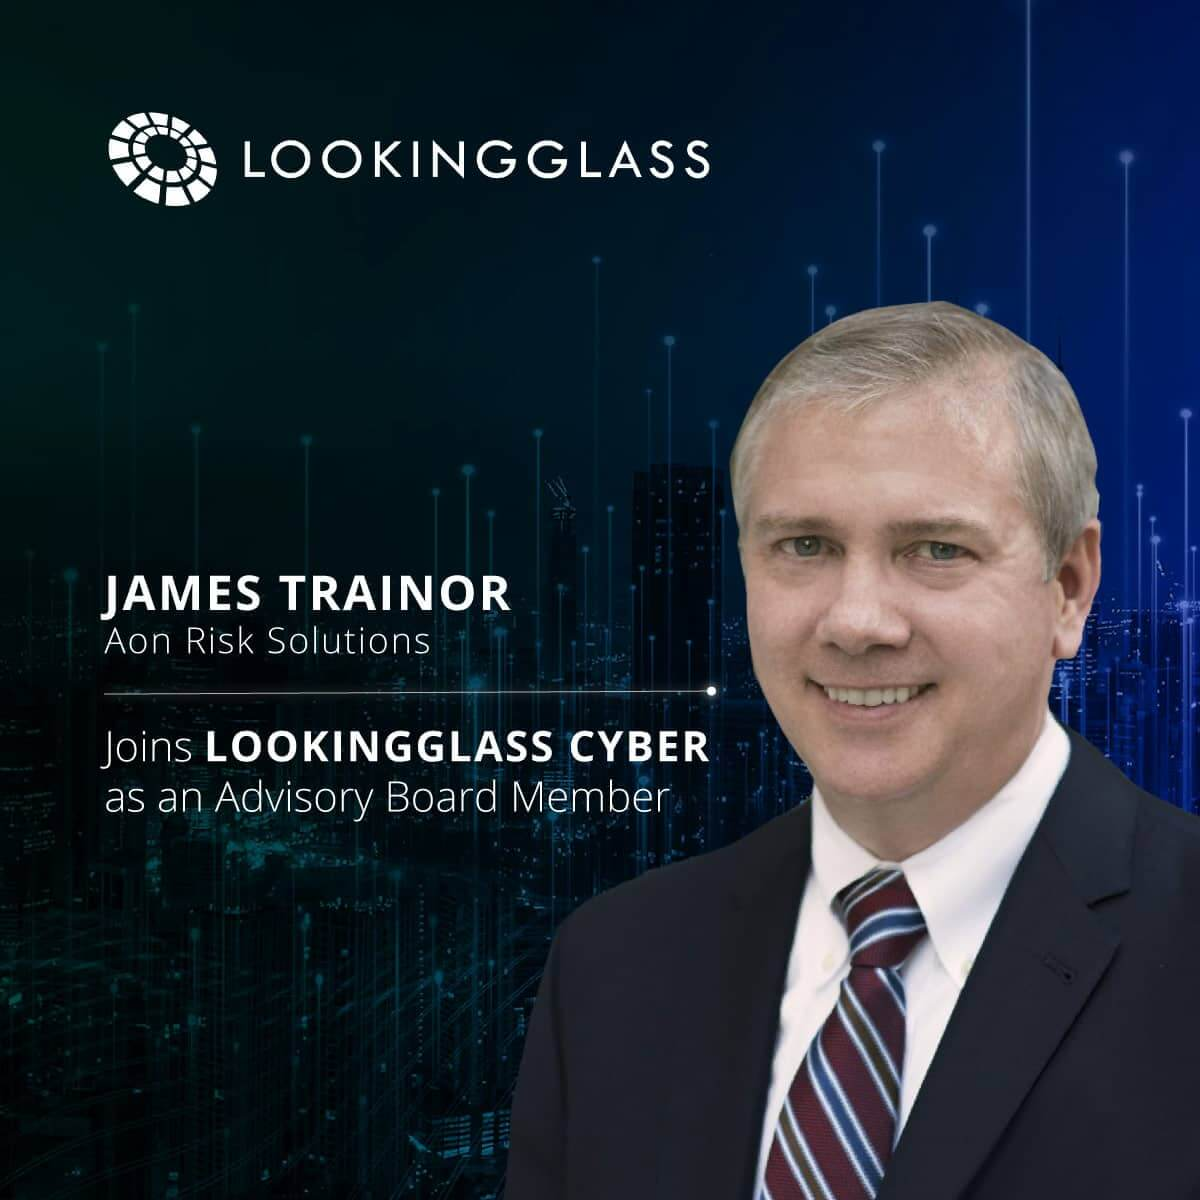 James Trainor